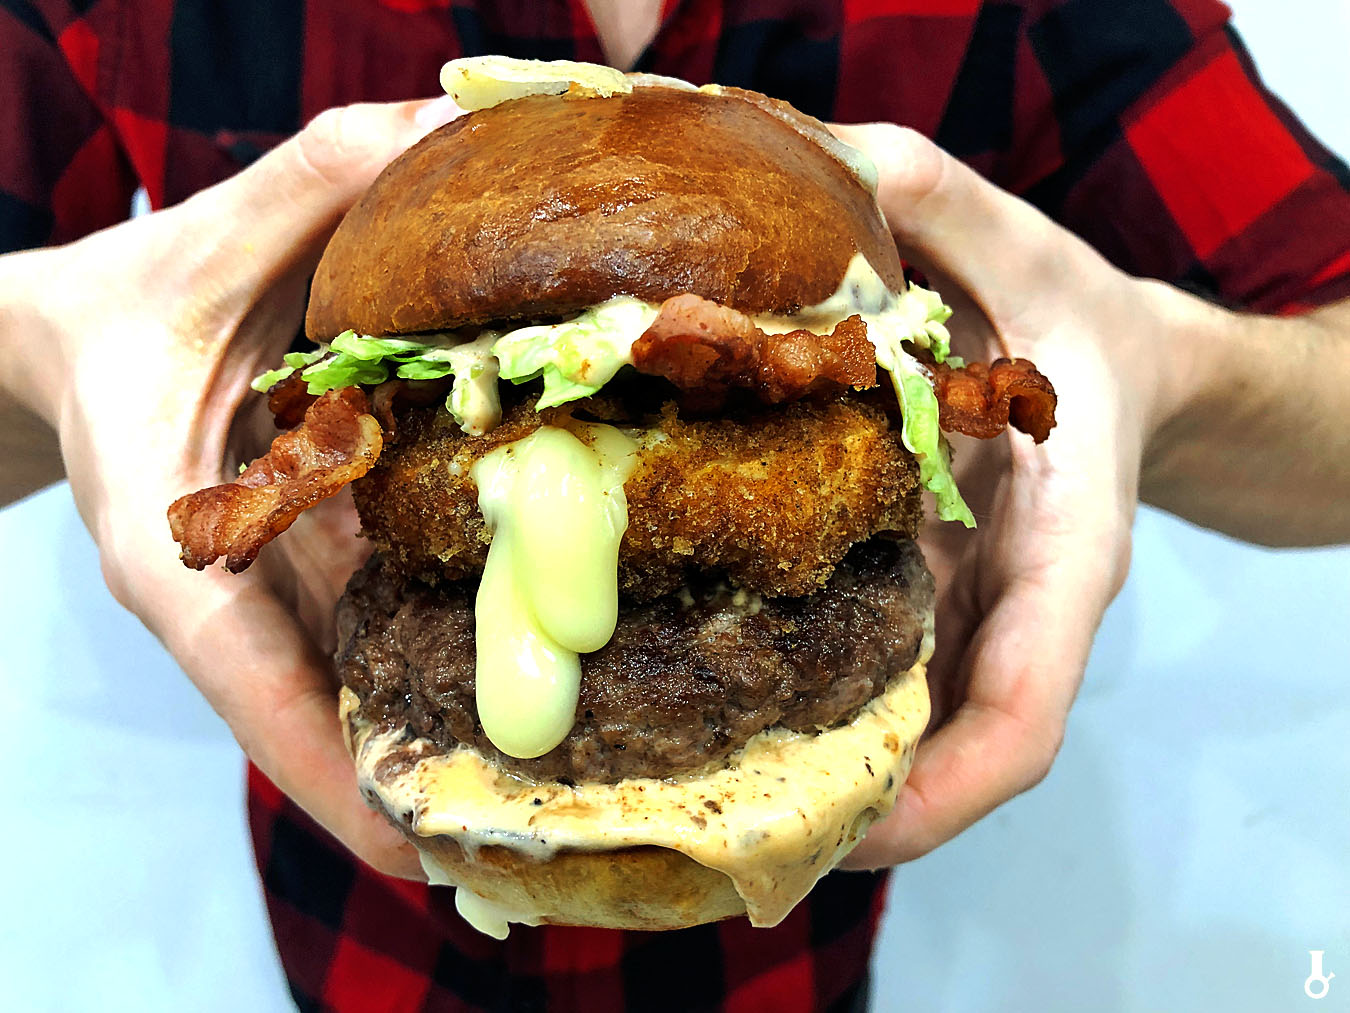 http://www.stonerchef.pl/wp-content/uploads/2019/01/burger-drwala.jpg